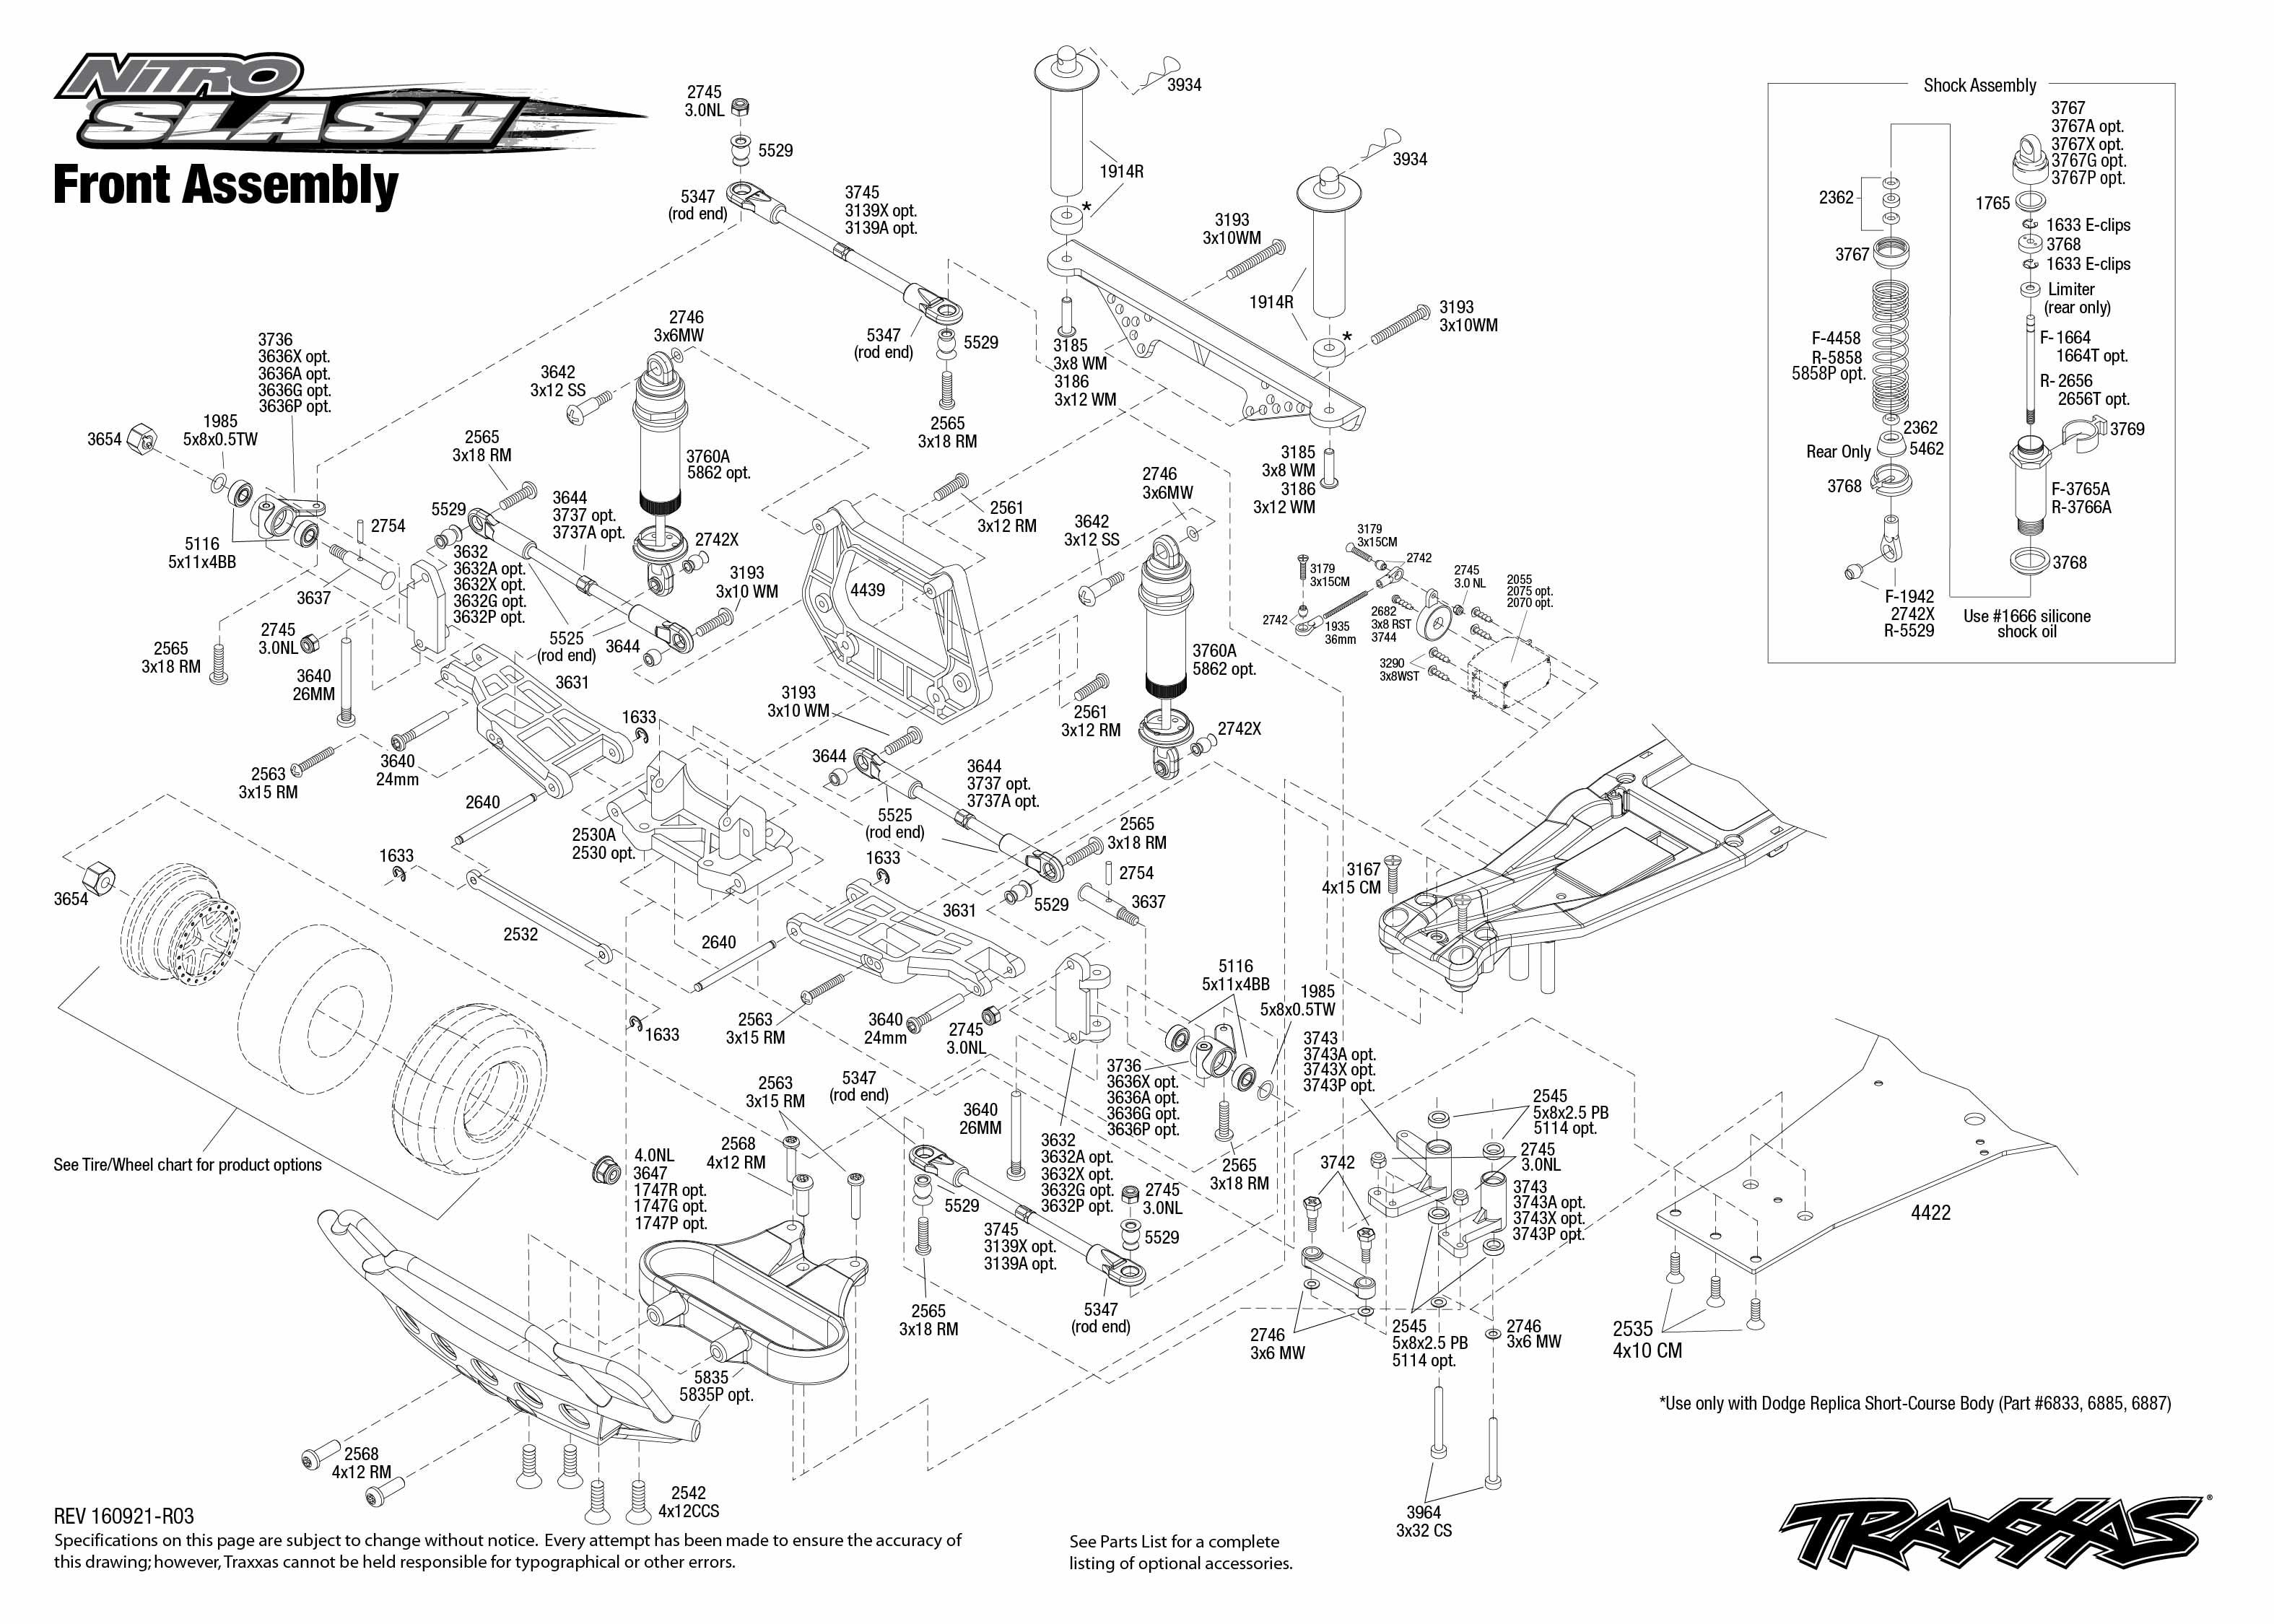 Traxxas Slash Wiring Diagram - Wiring Diagram